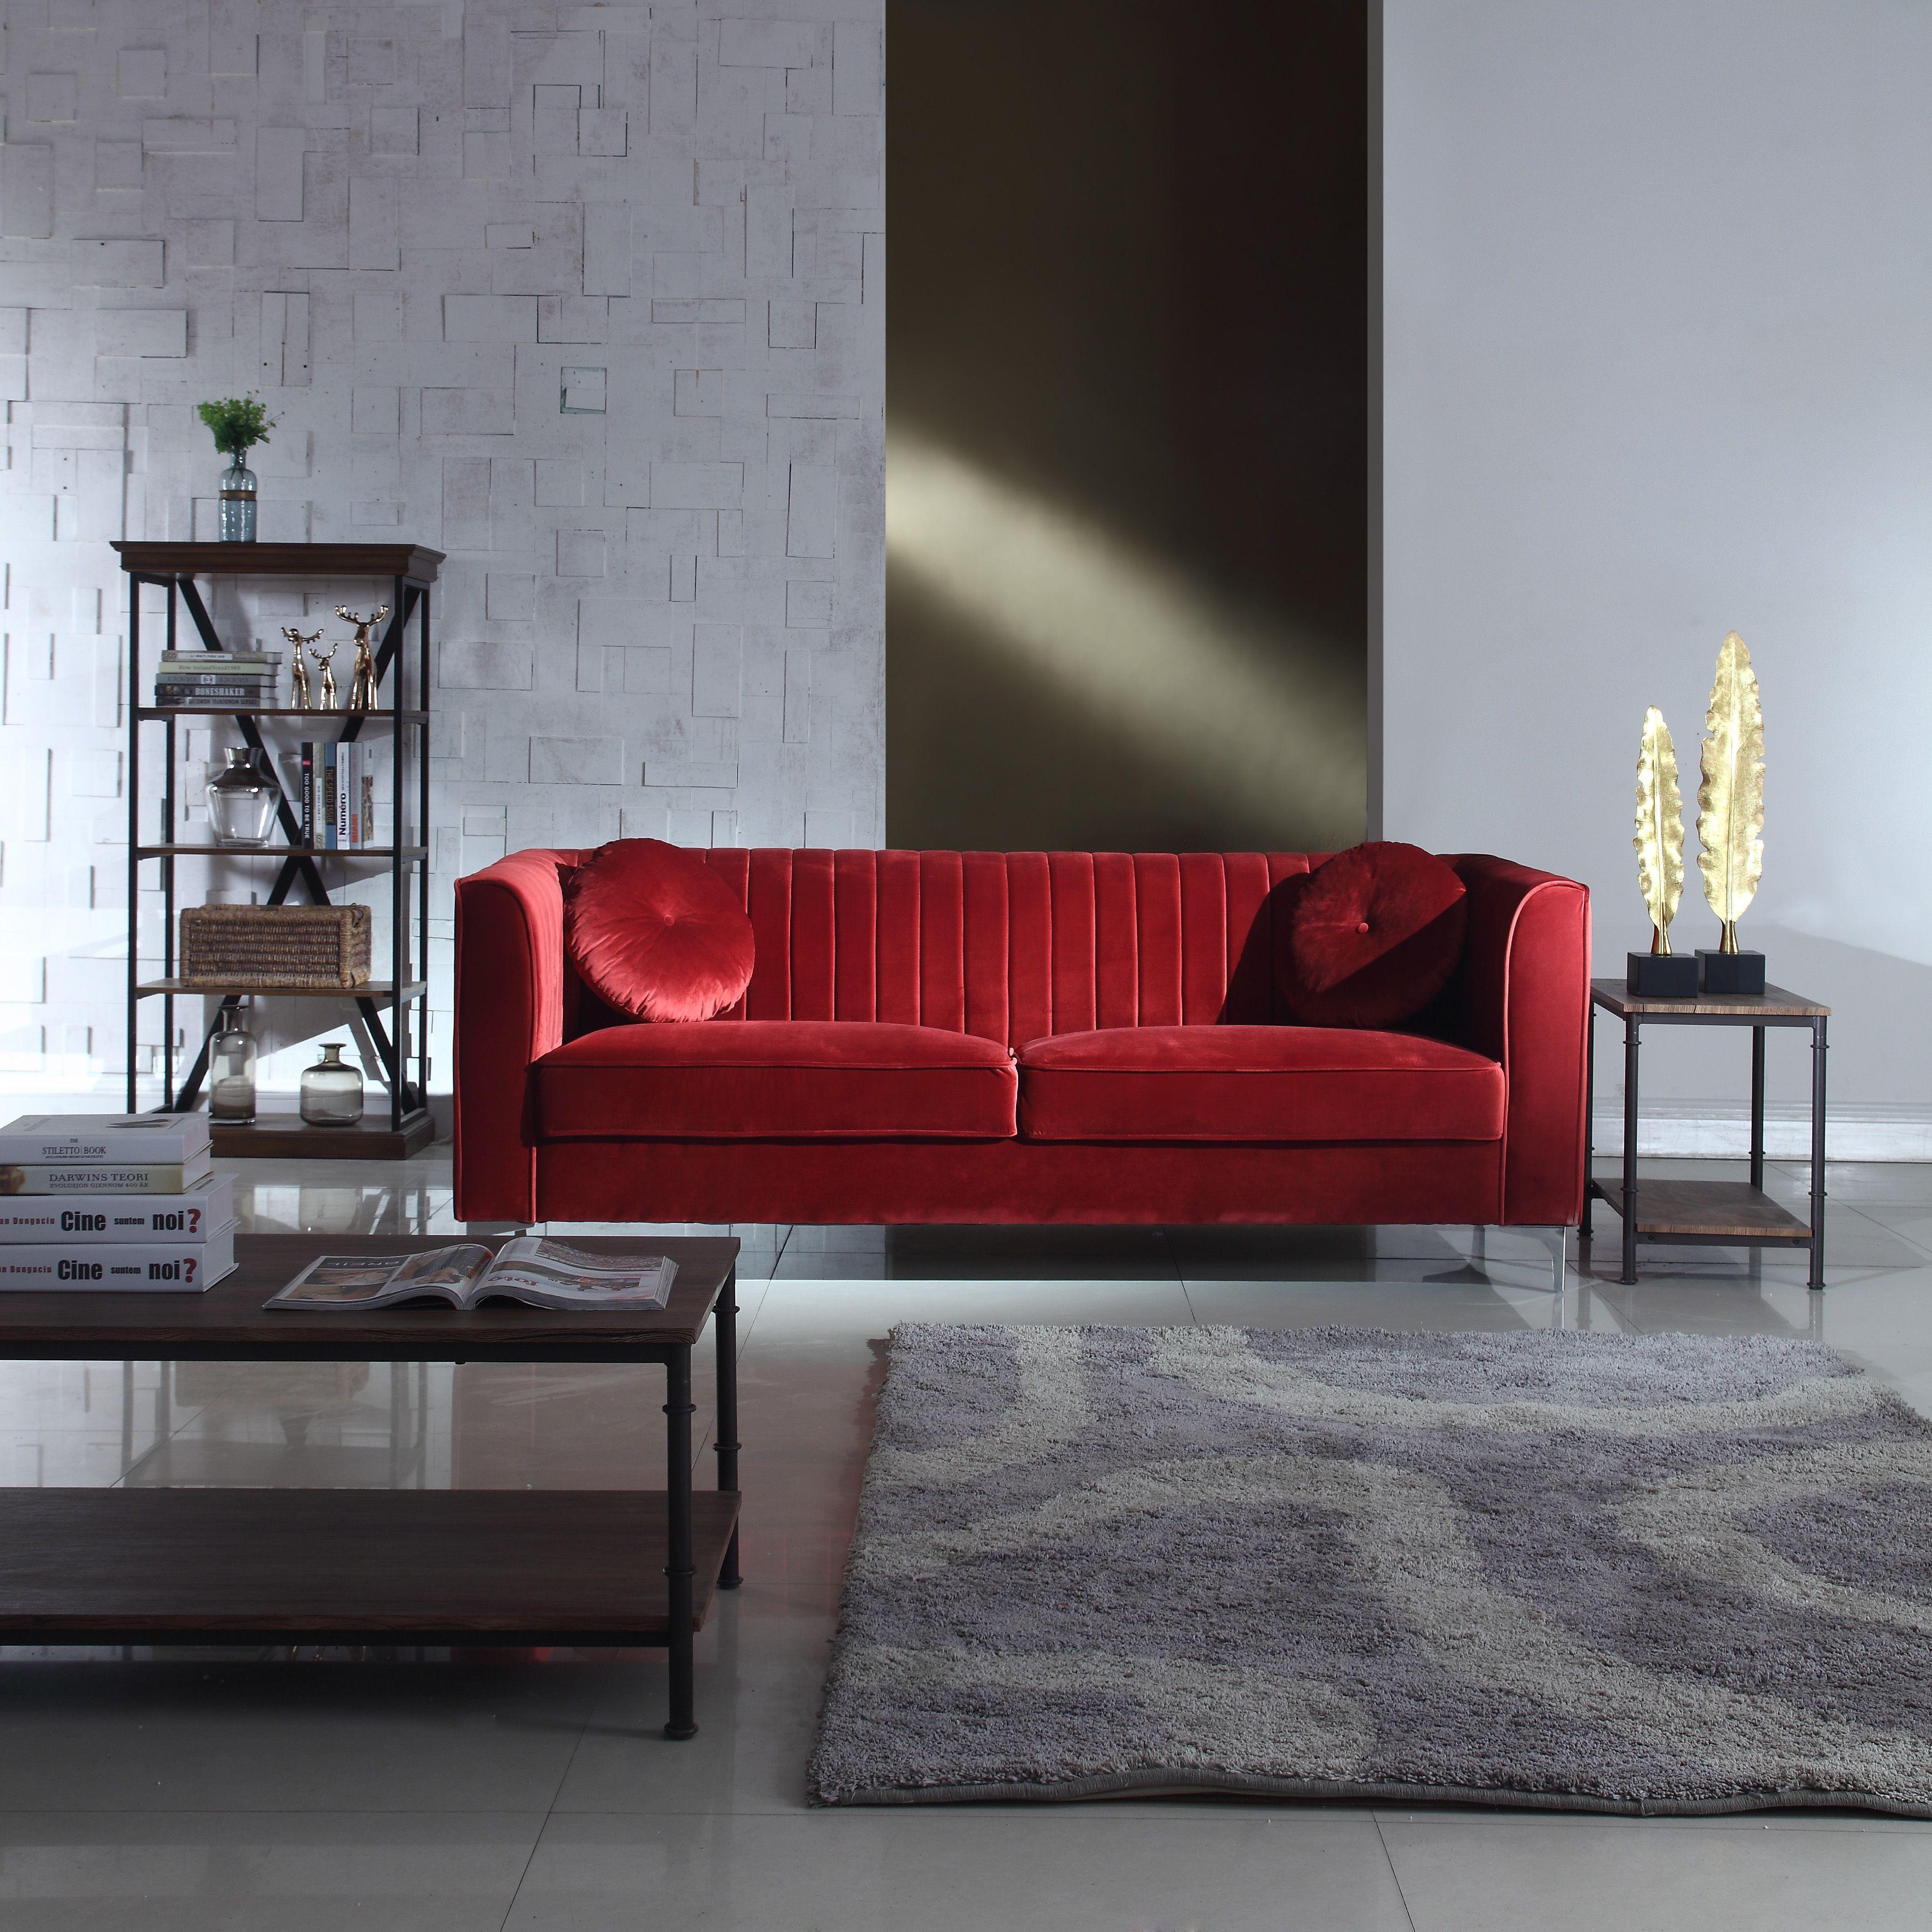 Brilliant Red Traditional Velvet Sofa Unemploymentrelief Wooden Chair Designs For Living Room Unemploymentrelieforg